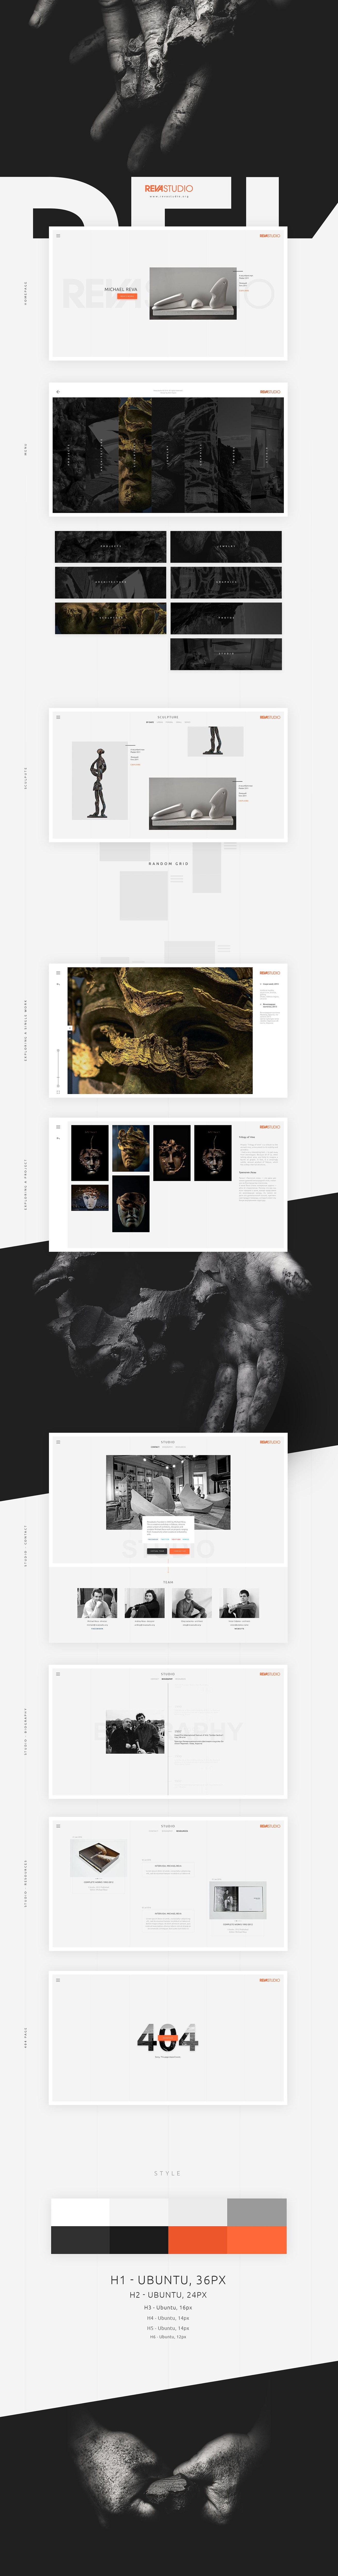 REVA Odessa plyuto zipl Web site studio art sculpture biography jewelry photo Masterpieces michael artist